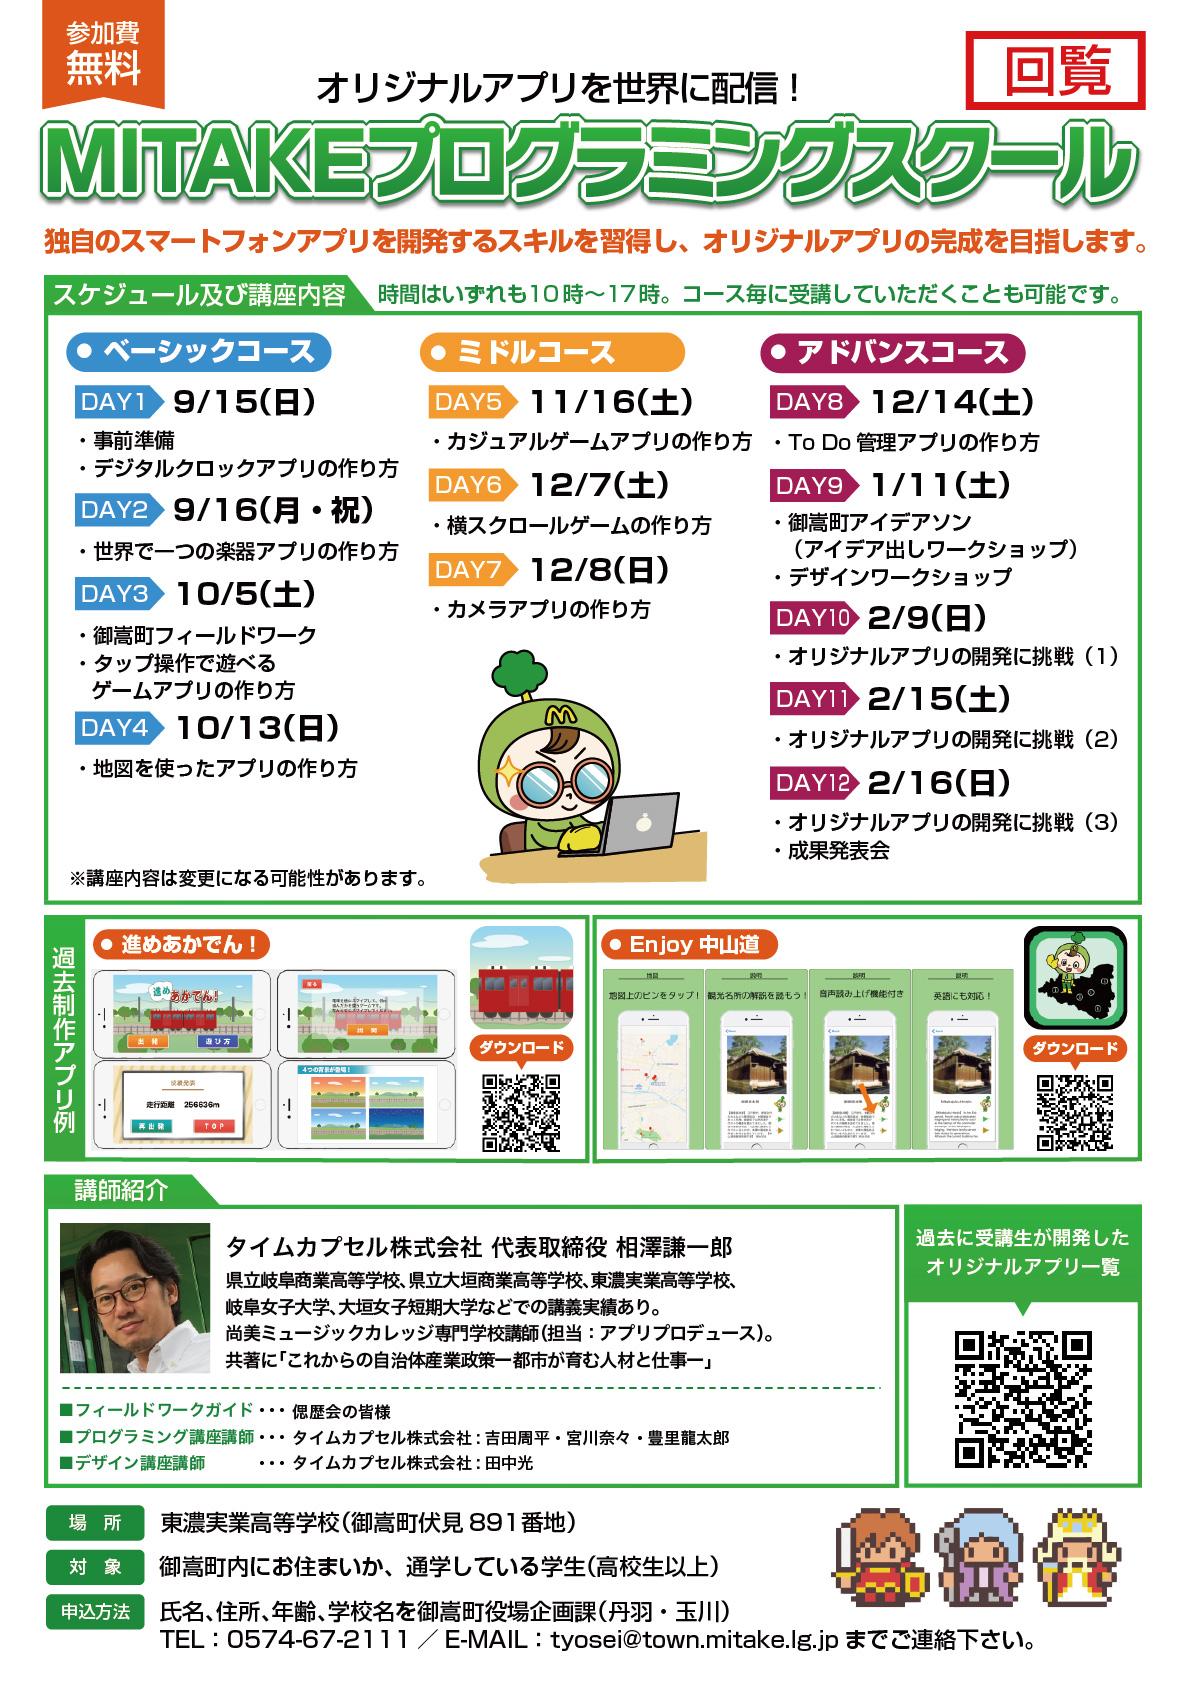 A4_chirashi_tate1-[更新済み]